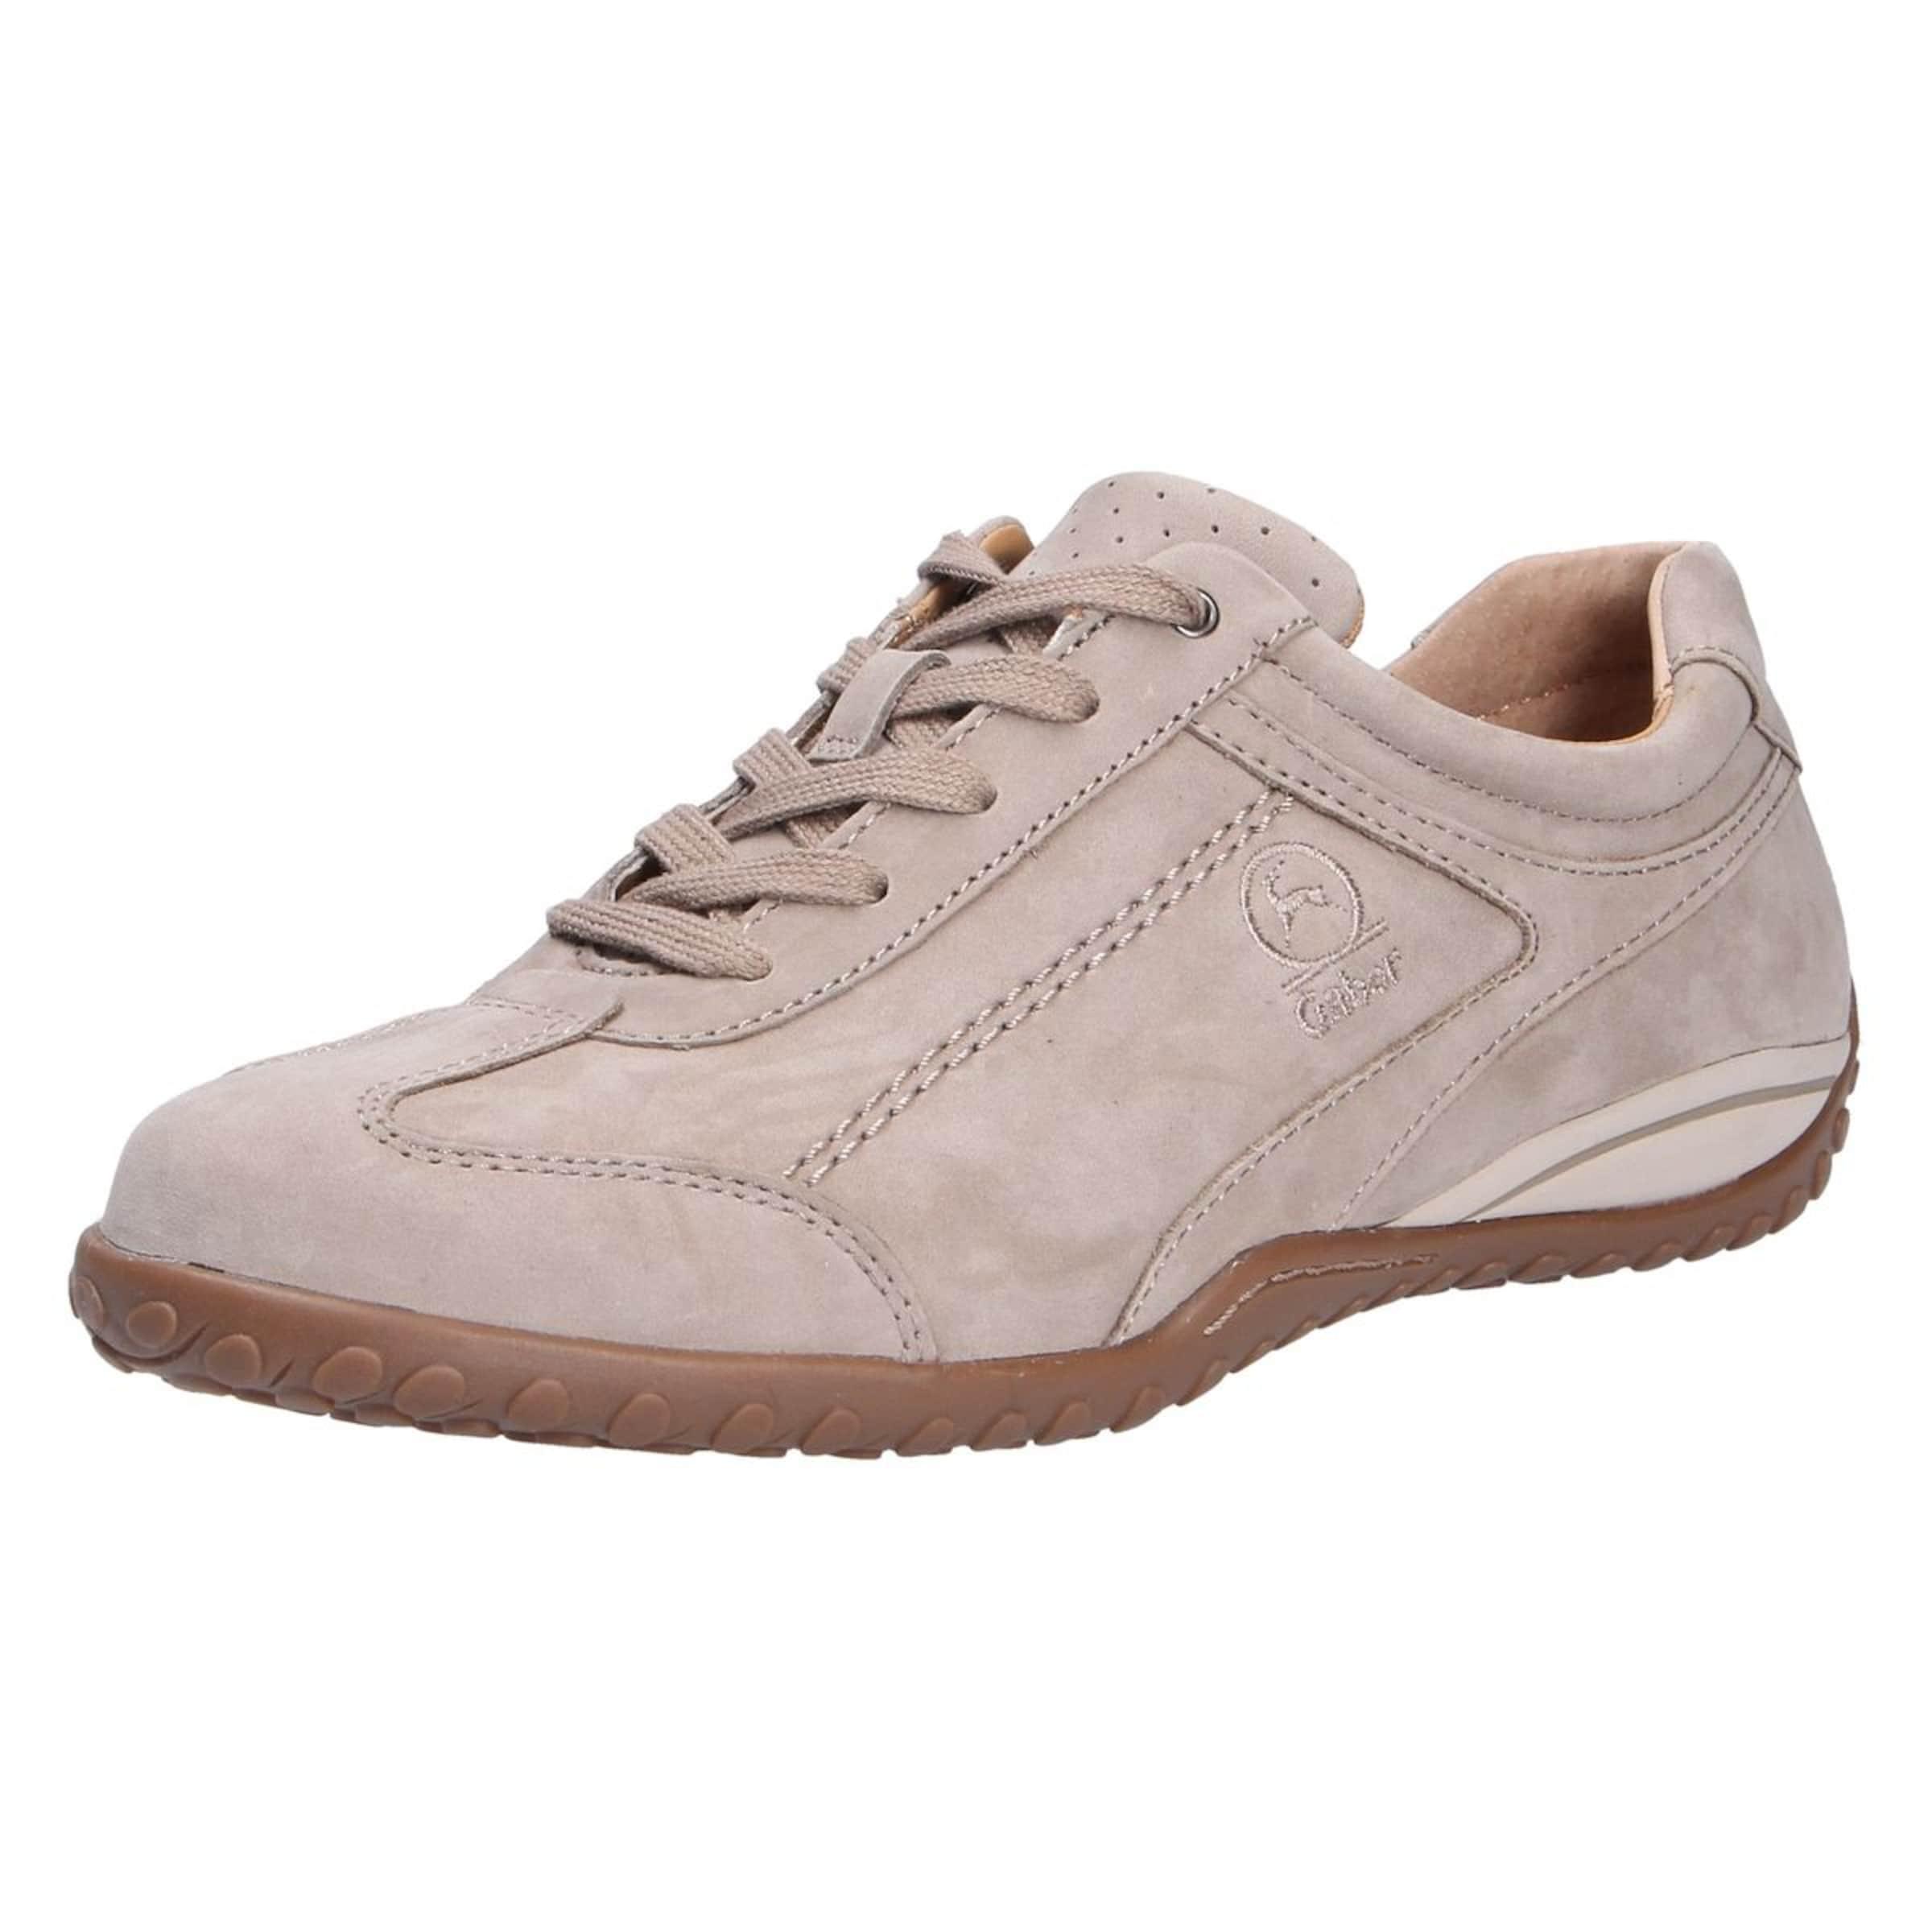 Taupe Sneakers In Gabor Sneakers Gabor In Taupe In Sneakers Taupe Gabor In Sneakers Gabor gfb7yY6